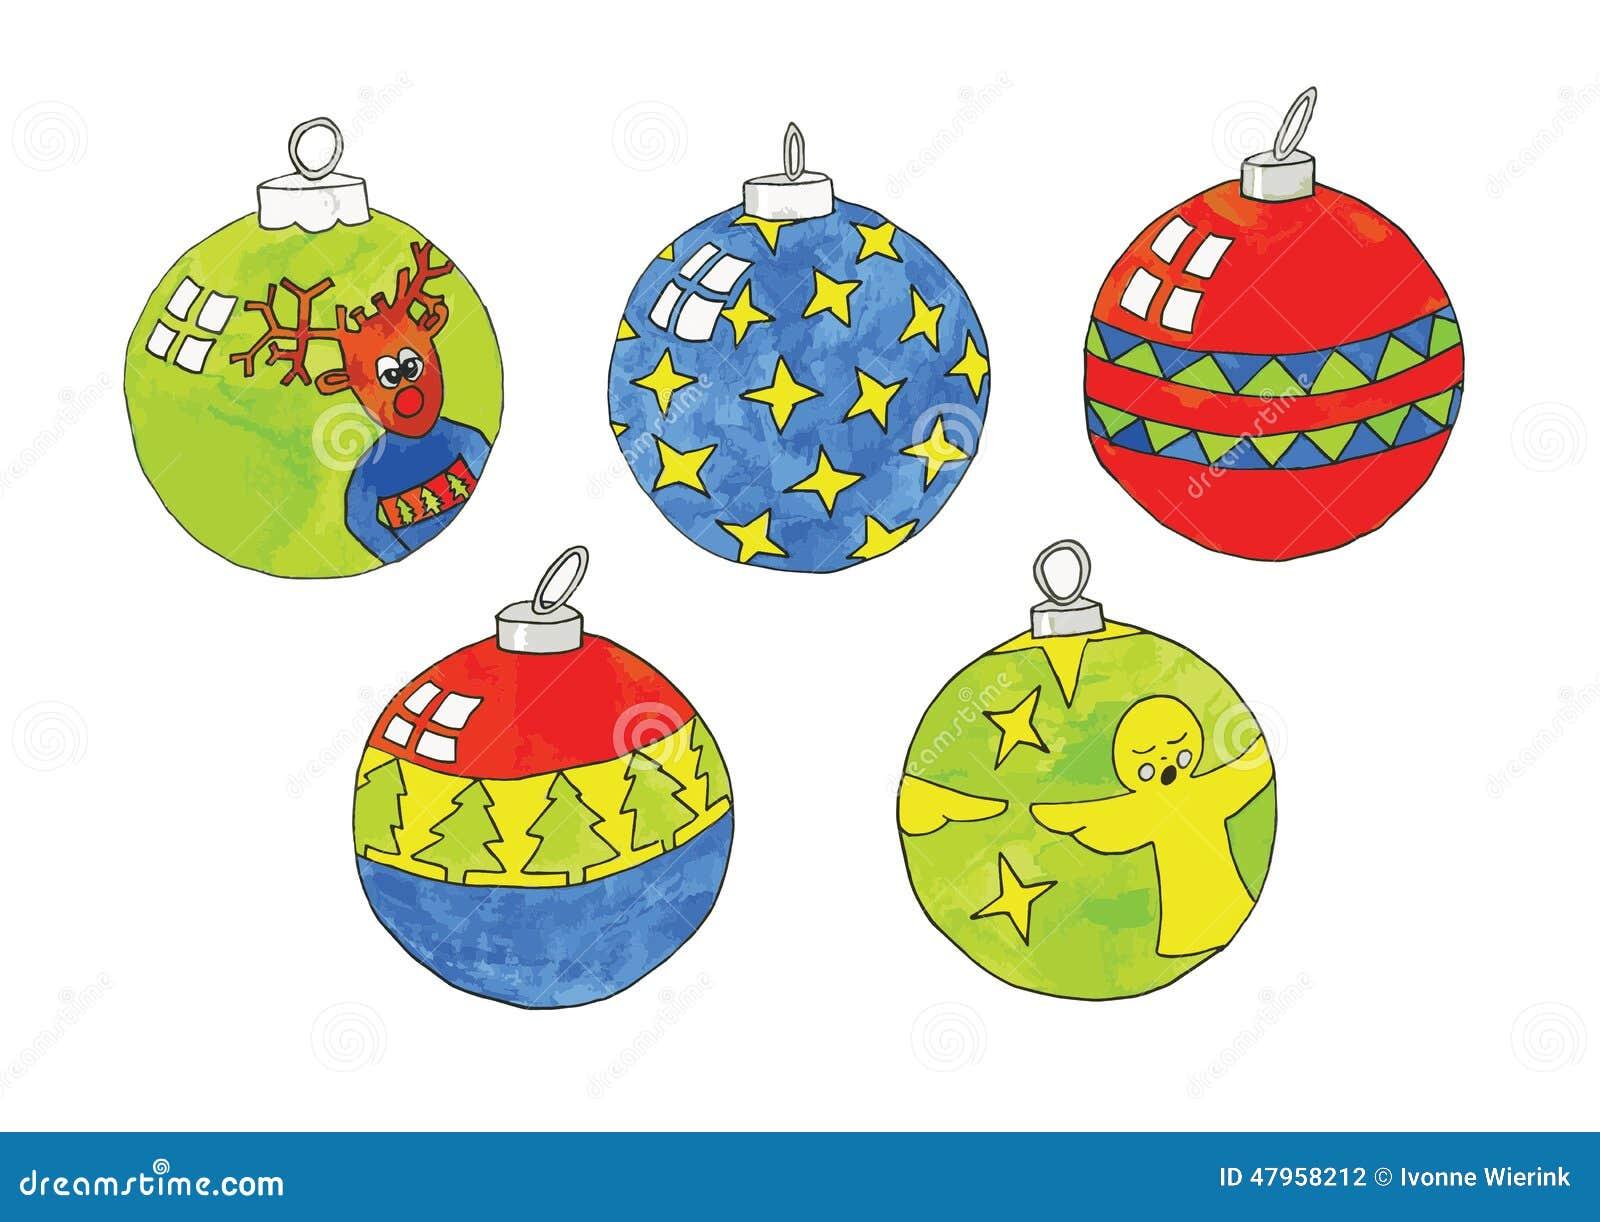 Colorful Christmas Ornaments Drawings.Christmas Balls Stock Vector Illustration Of Reindeer